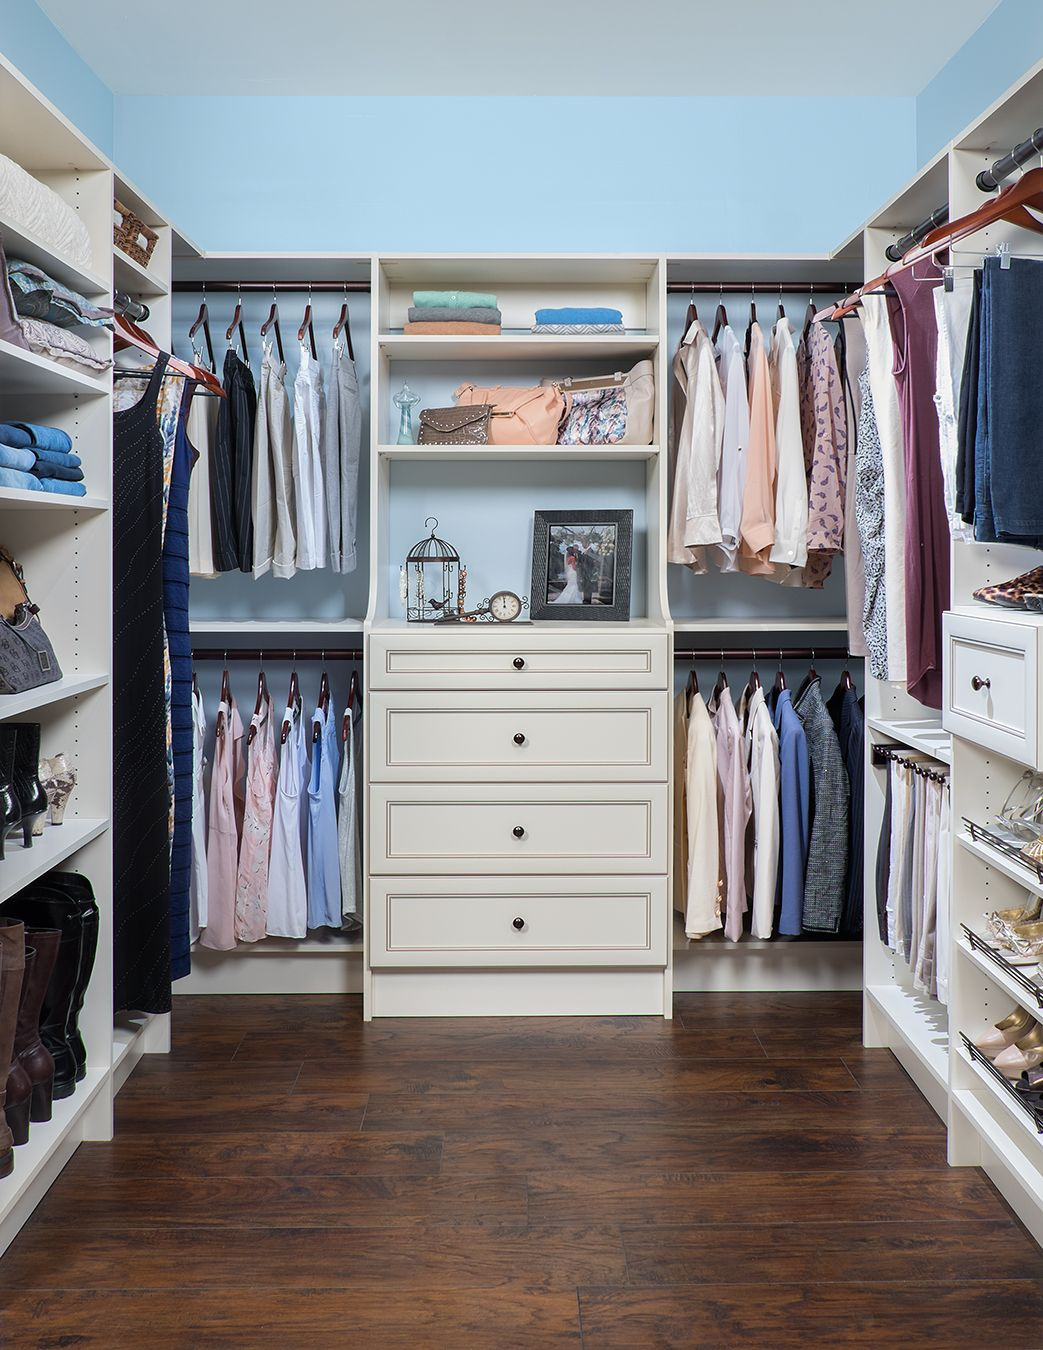 Bon ... MAKEOVERS | Closet Ideas Walk In | Closet Ideas For Clothes | Closet  Ideas For Small Bedrooms | Closet Ideas Home Depot | Closet Arrangement  Ideas